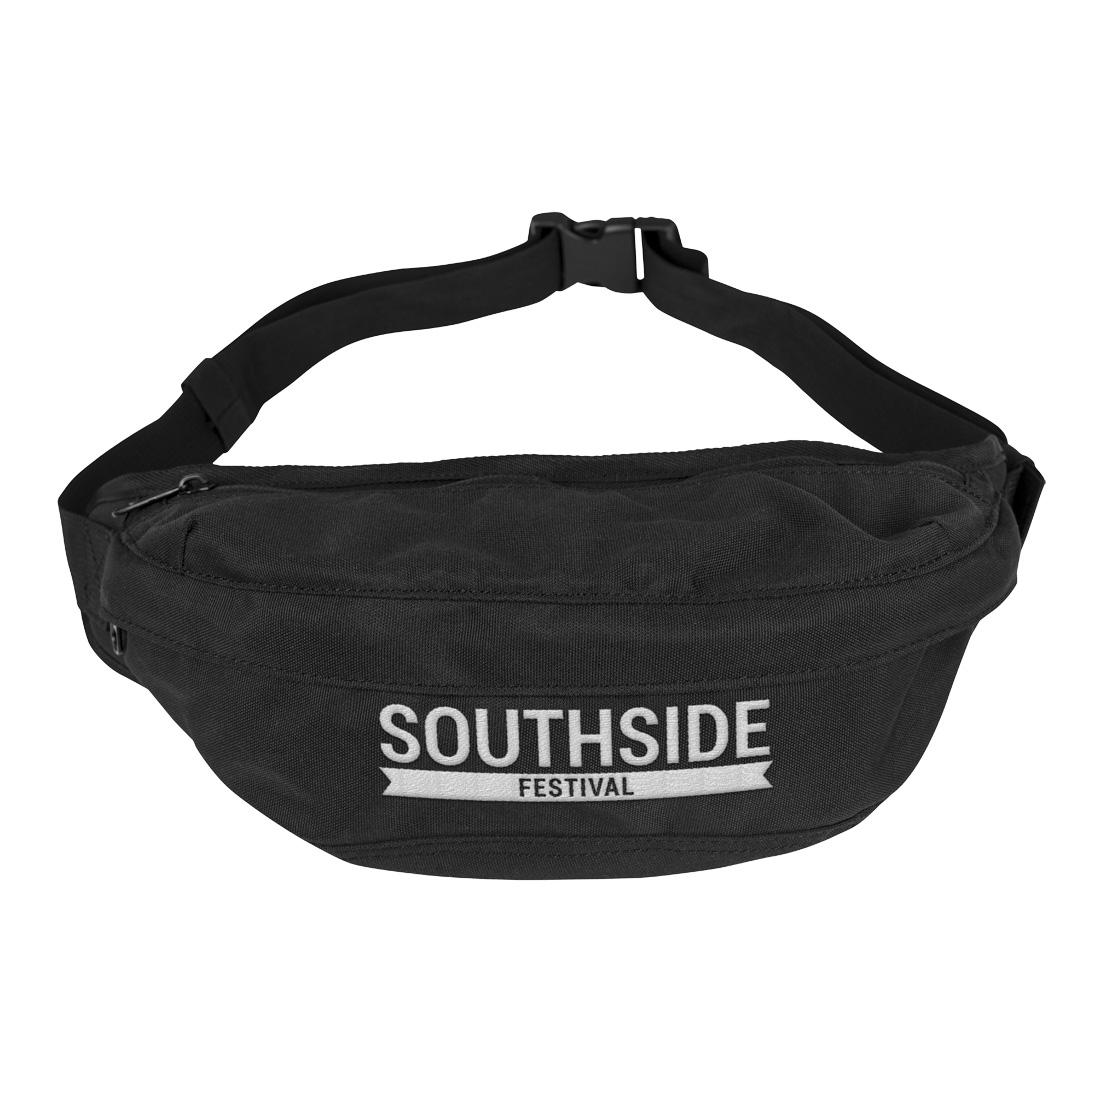 Logo von Southside Festival - Shoulder Bag jetzt im My Festival Shop Shop